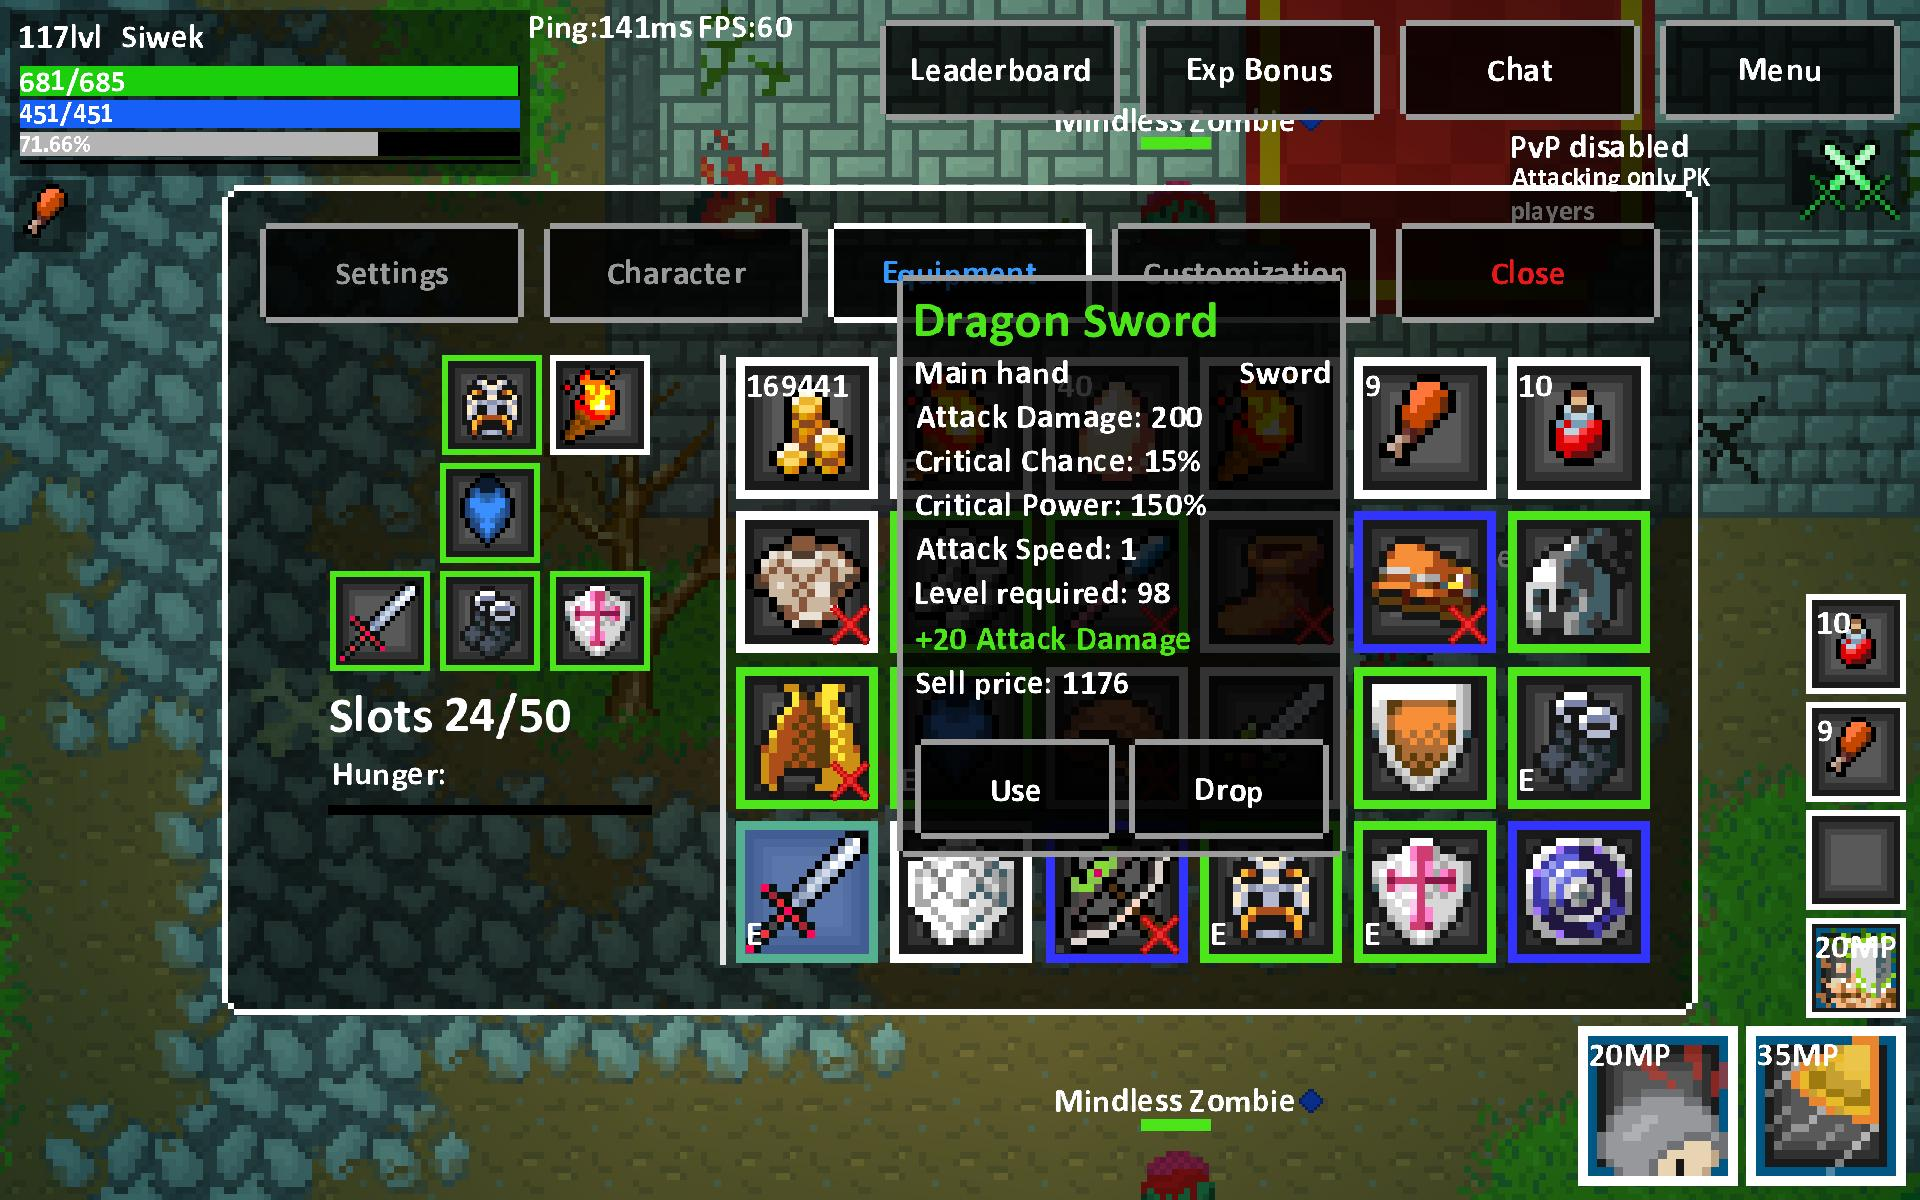 Heroes & Rats MMORPG Online 0.32.2 Screenshot 12